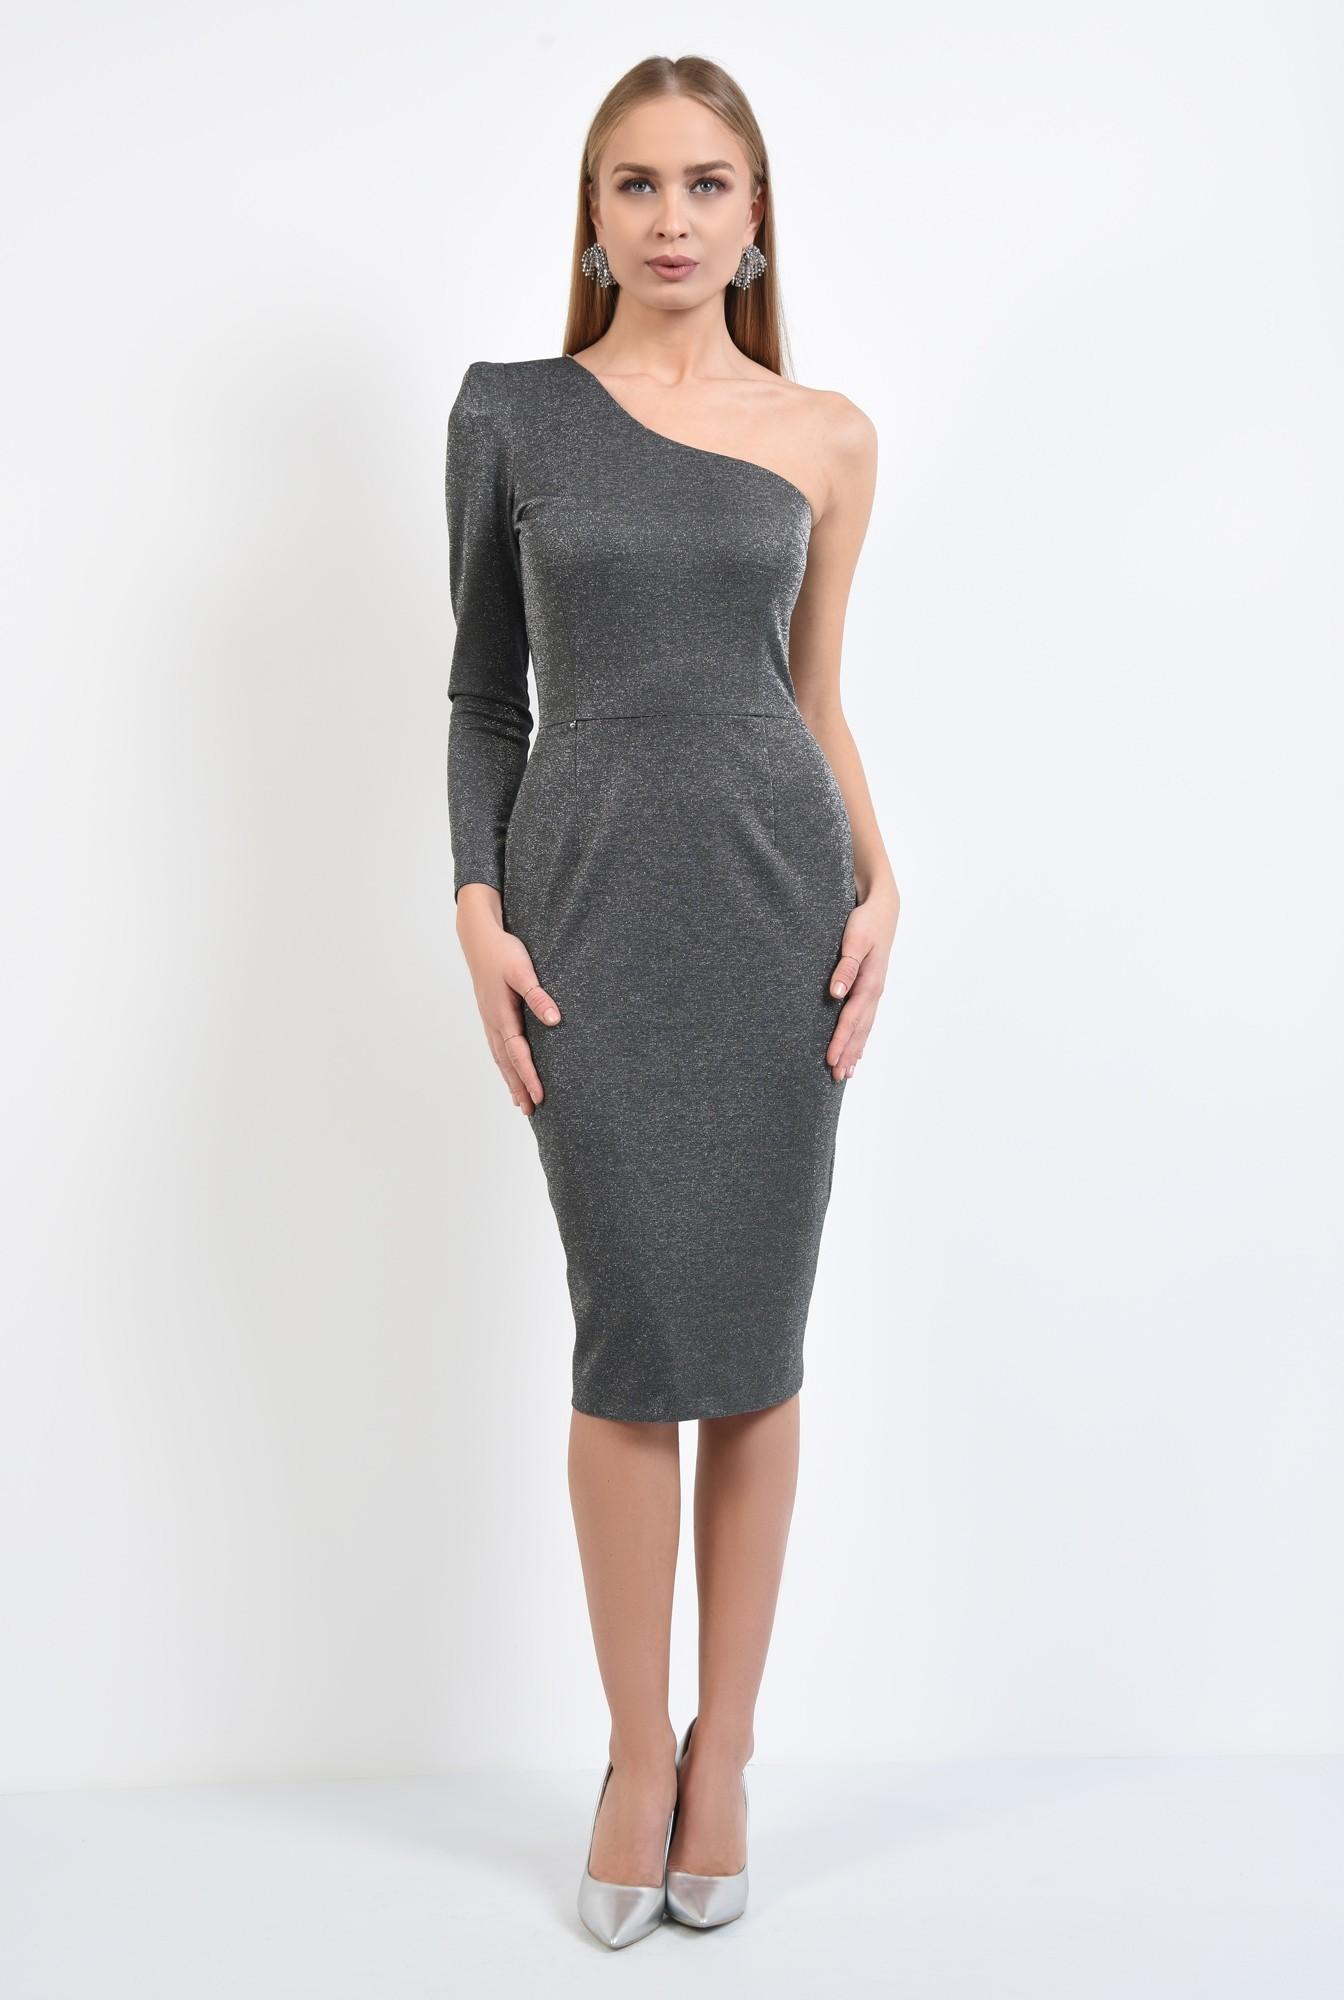 3 - rochie eleganta, conica, midi, argintie, rochii online